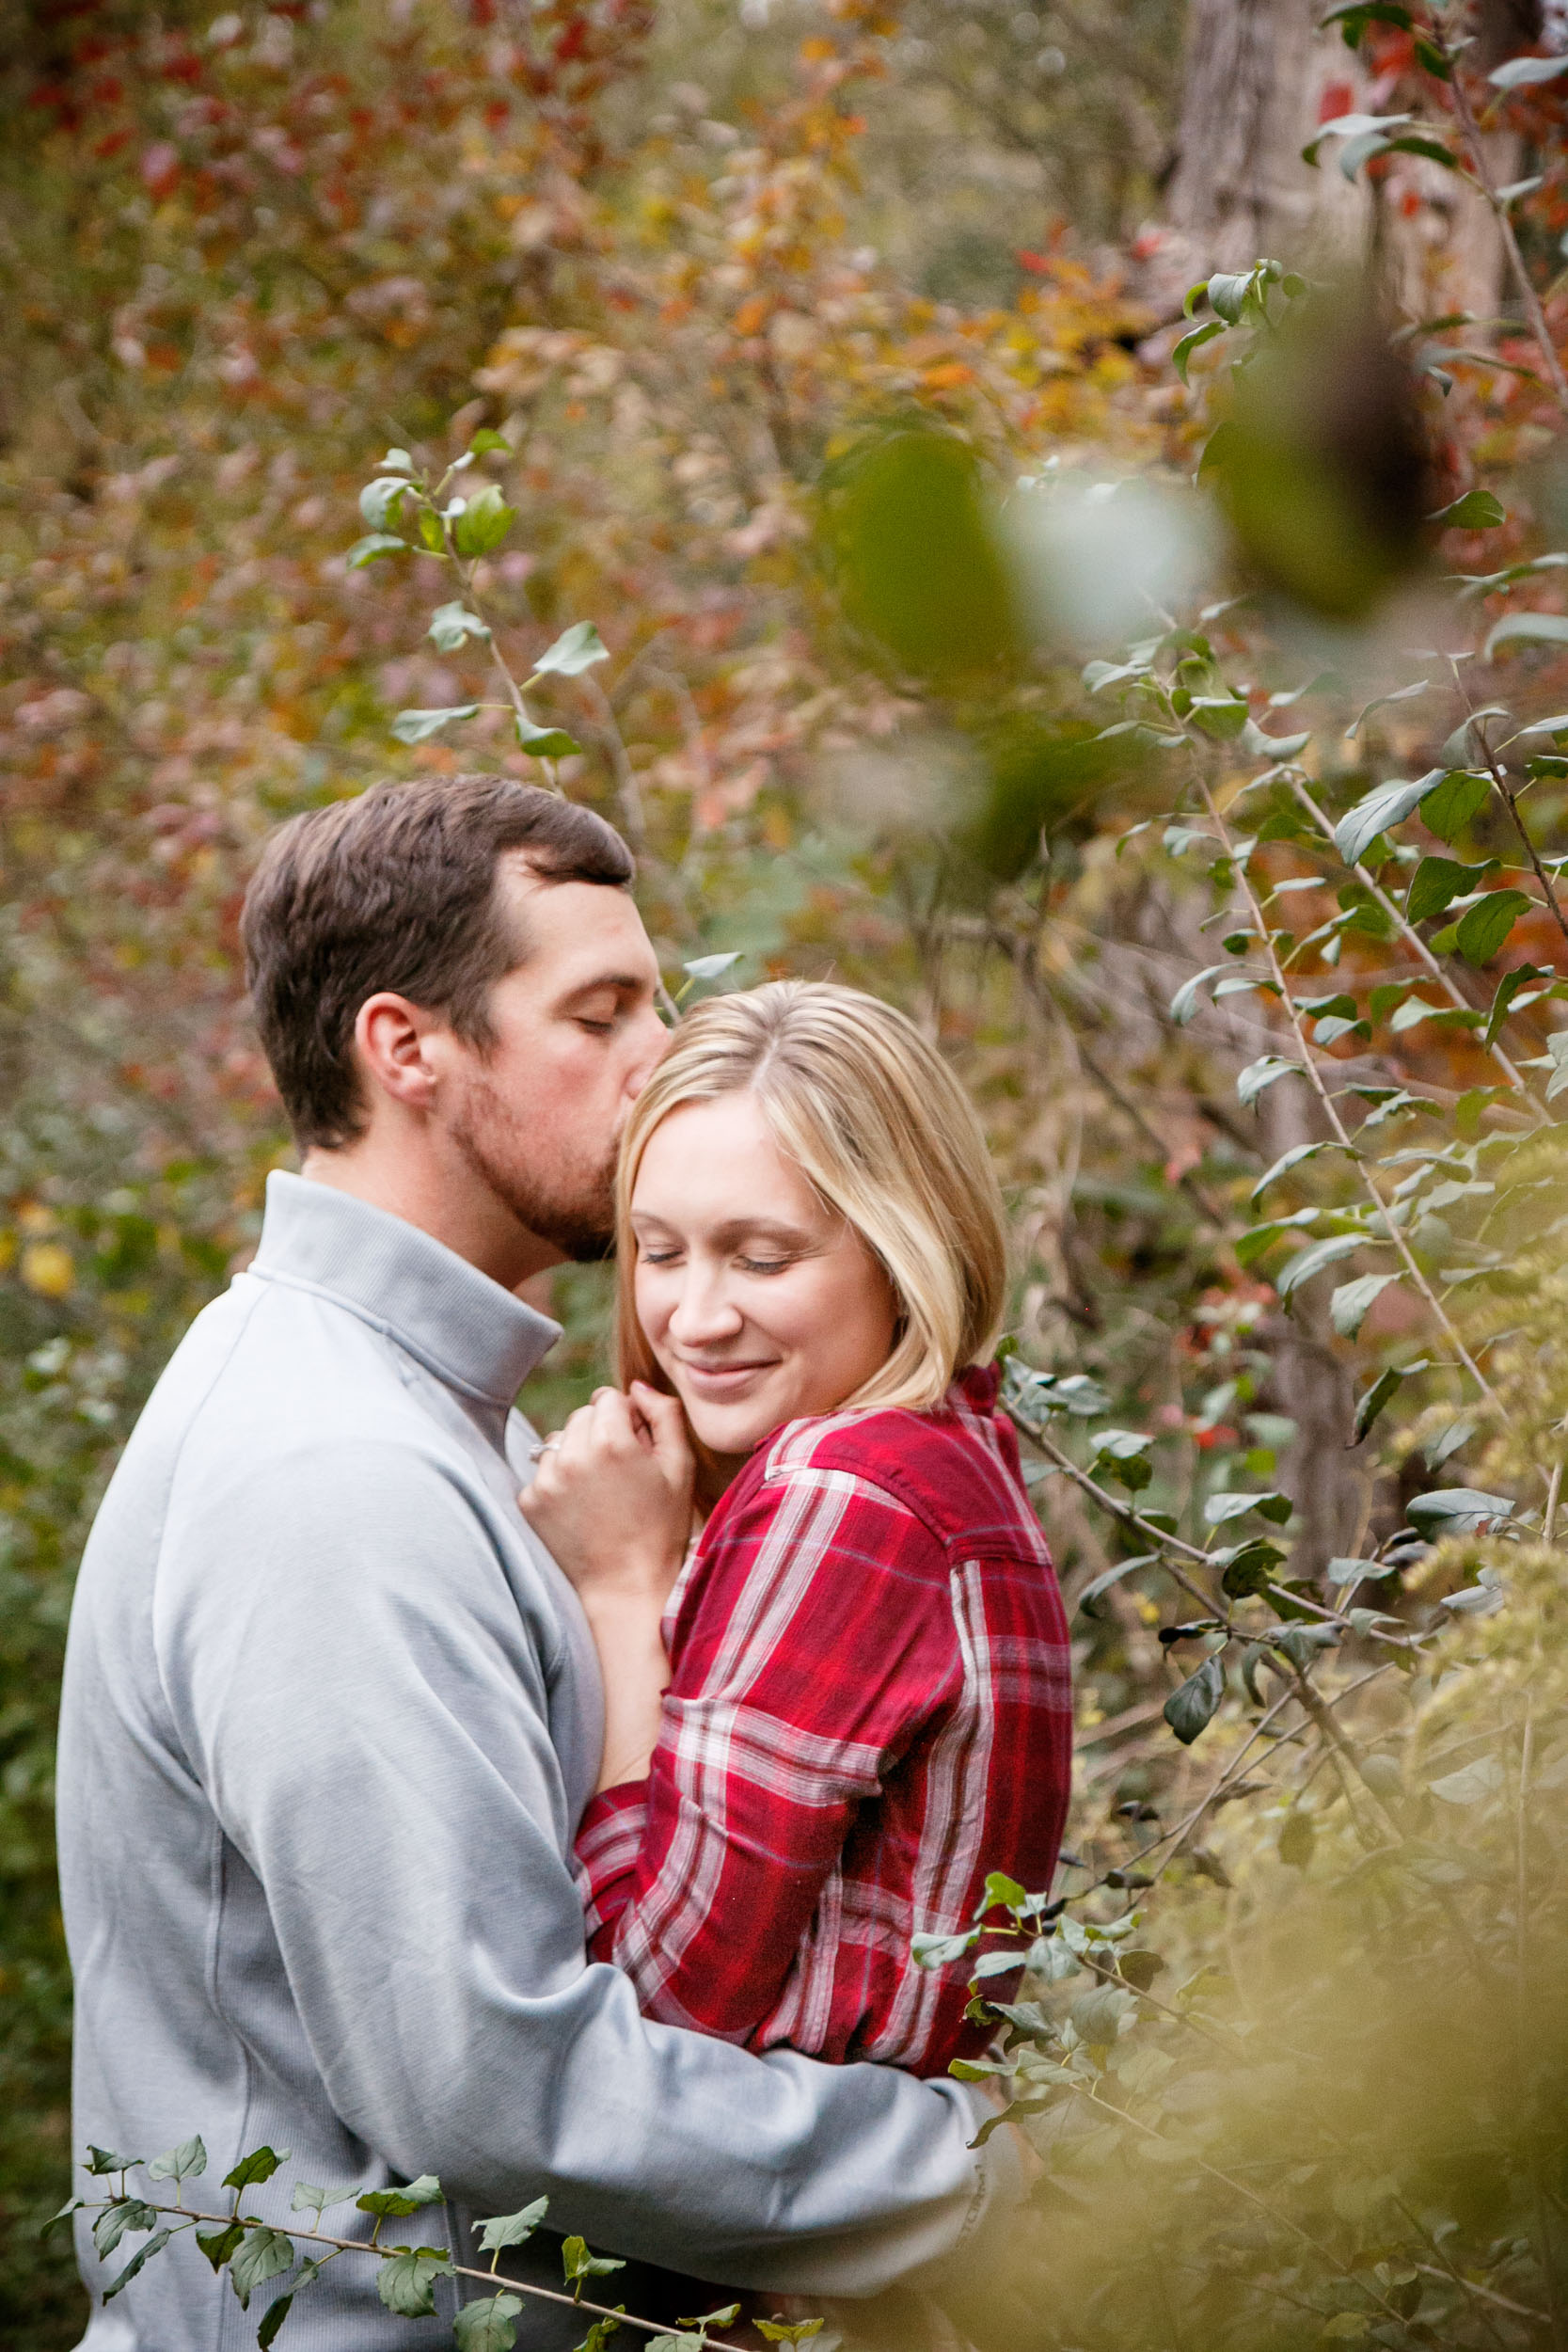 fall-engagement-photos-clothes-to-wear-adam-shea-photography-green-bay-appleton-neenah-photographer-8.jpg